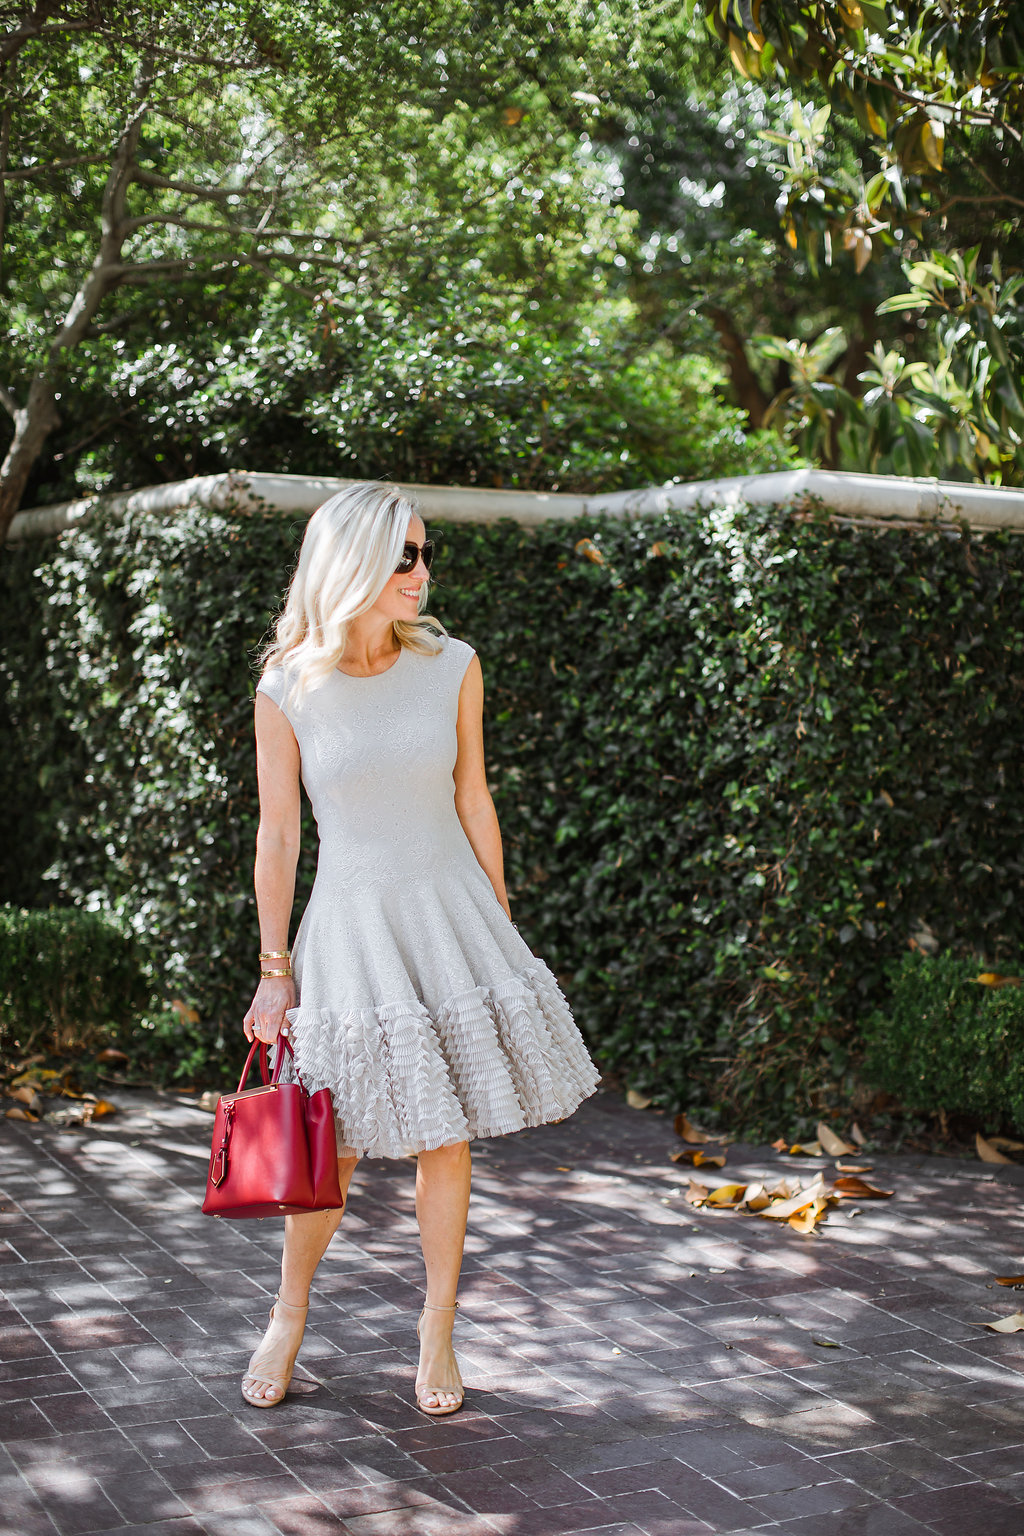 Alicia Wood, Dallas Fashion Blogger, Dallas Lifestyle Expert, Clotheshorse Anonymous, Alexander McQueen